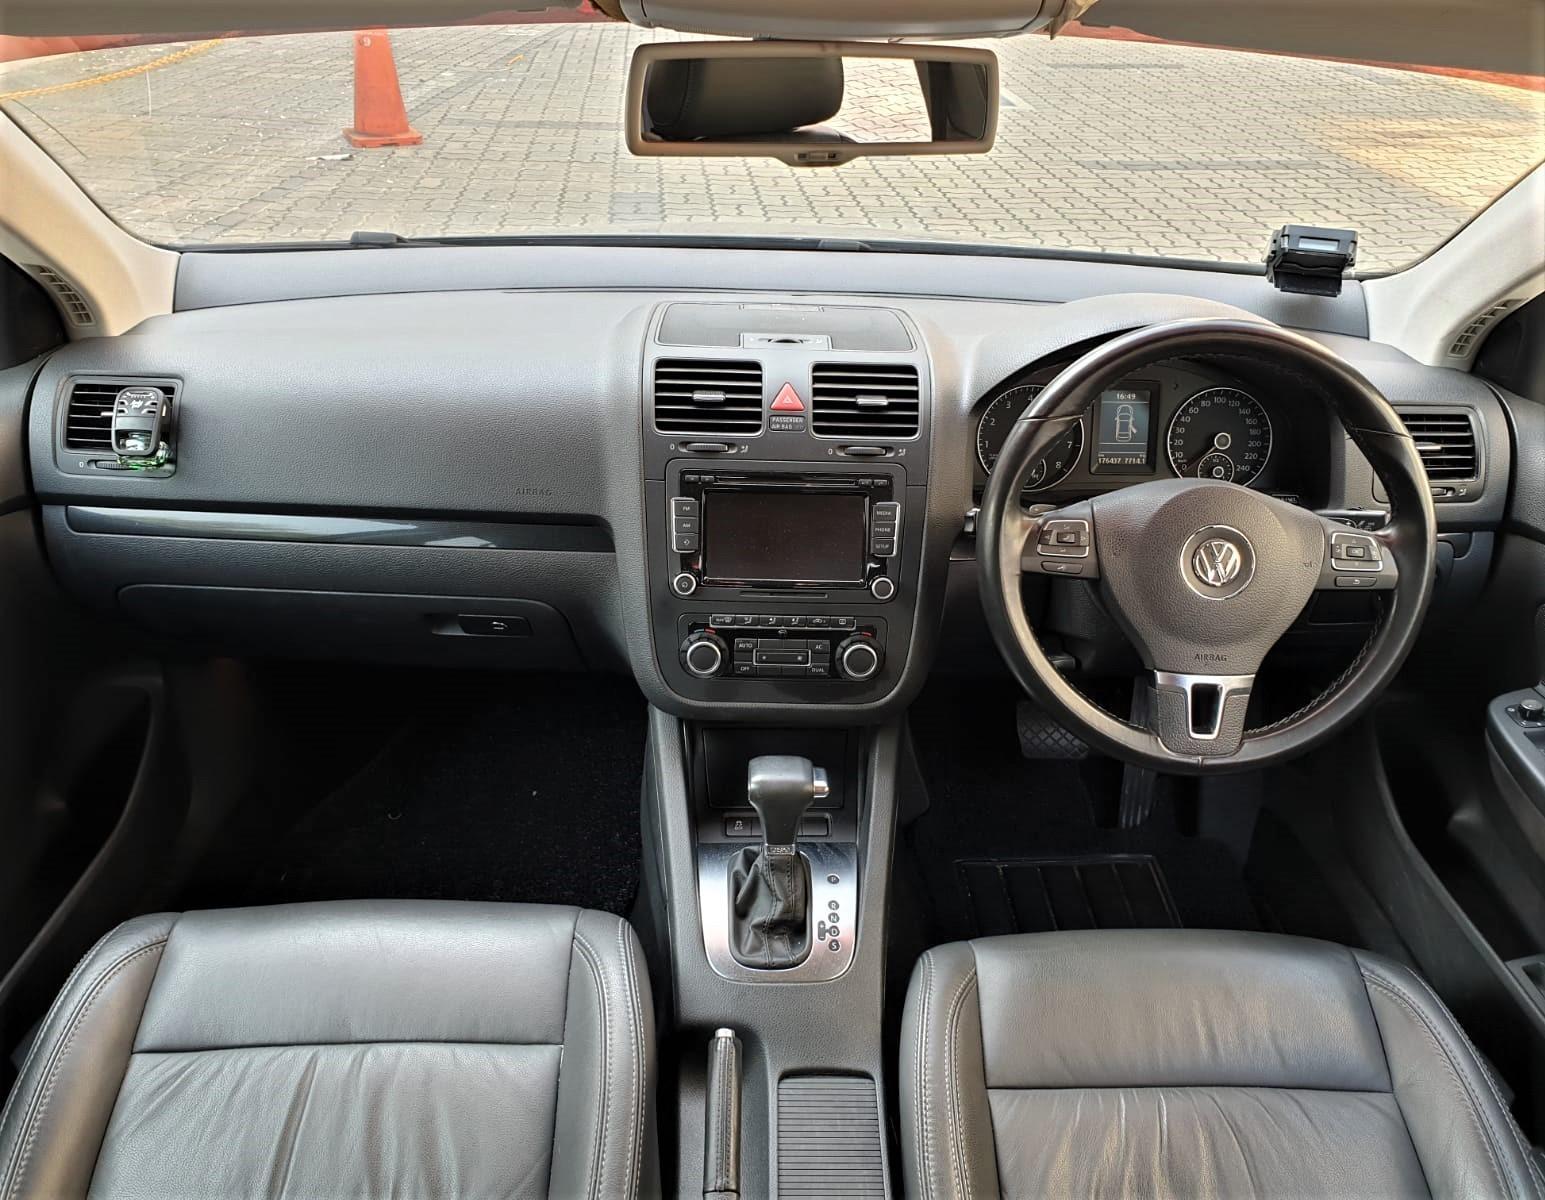 Volkswagen Jetta TSI 1.4A - Best rates, full servicing provided!